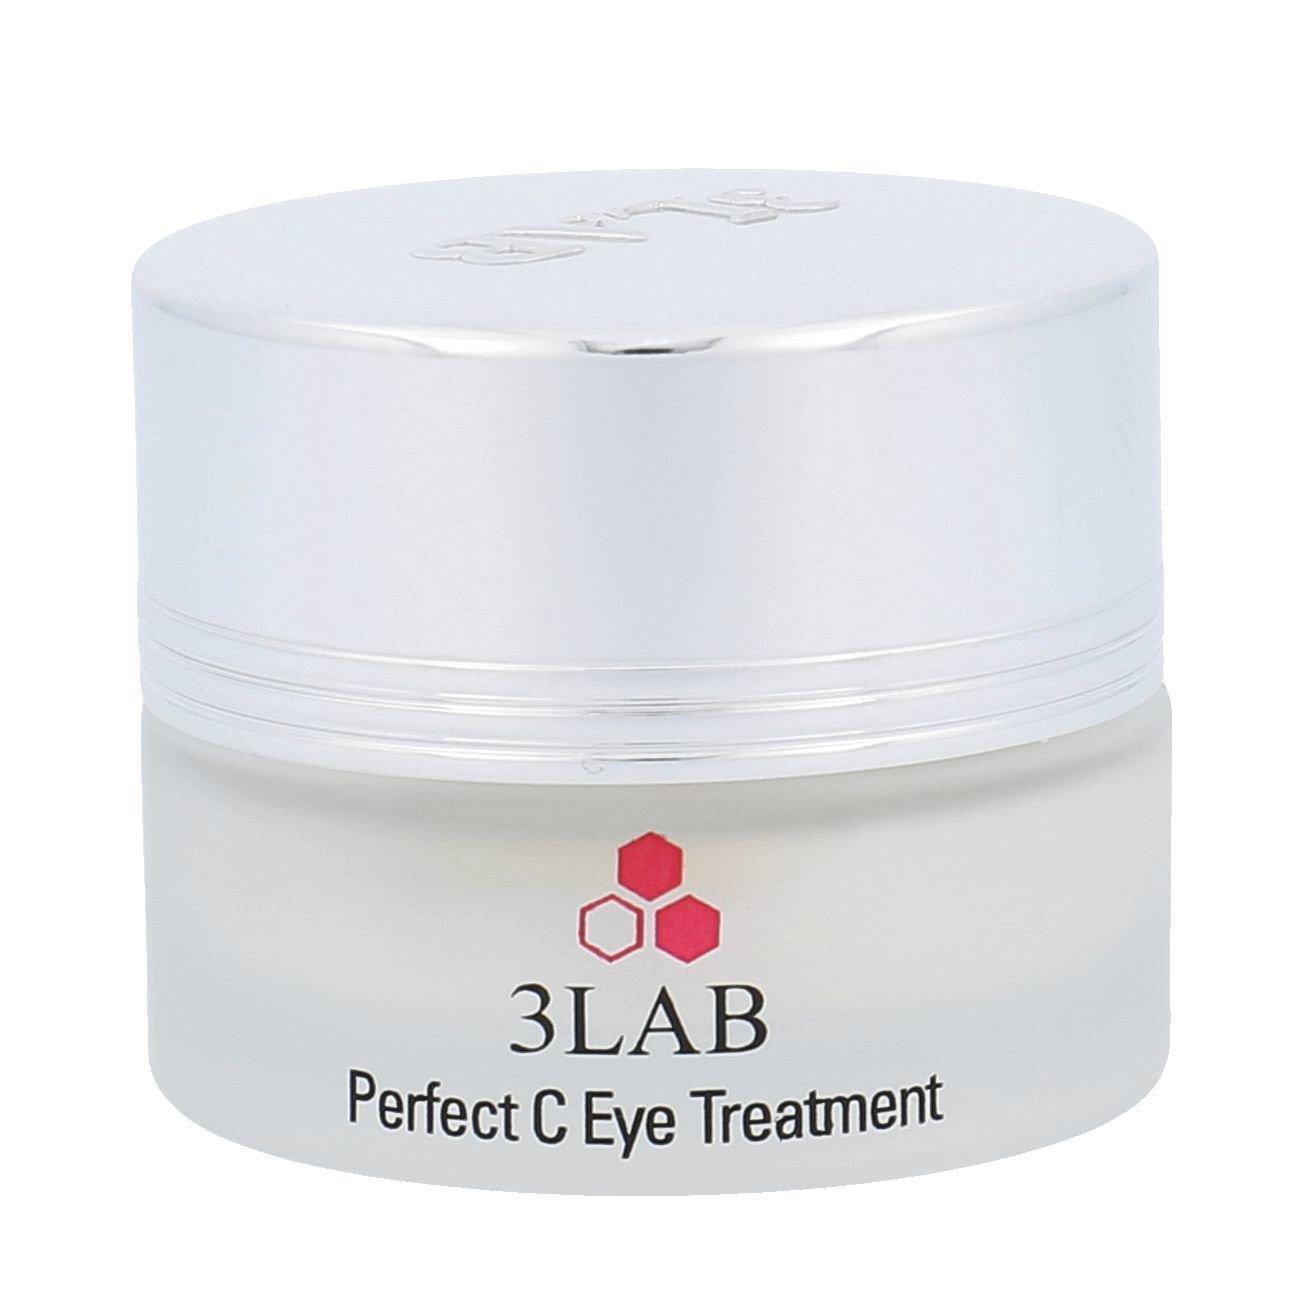 3LAB Perfect Cosmetic 14ml  C Eye Treatment